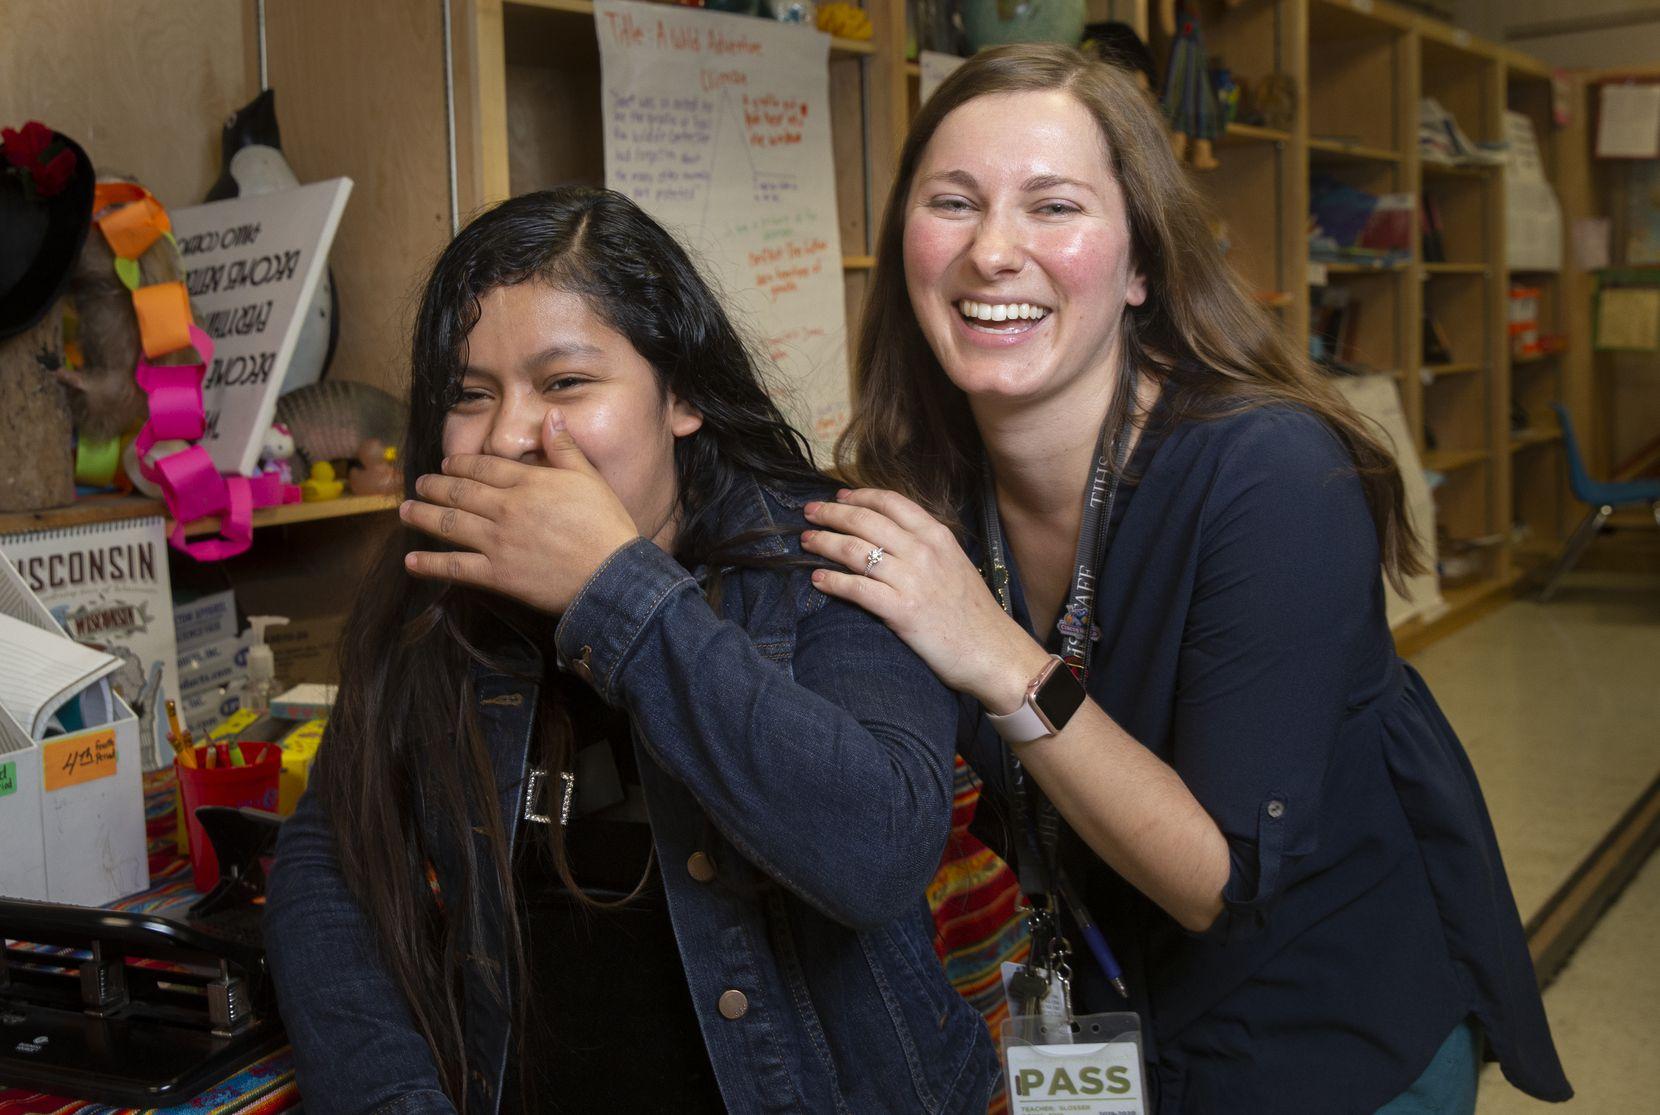 Freshman Silvia Rey (left) and ESL teacher Autumn Slosser share a laugh at Thomas Jefferson High School.